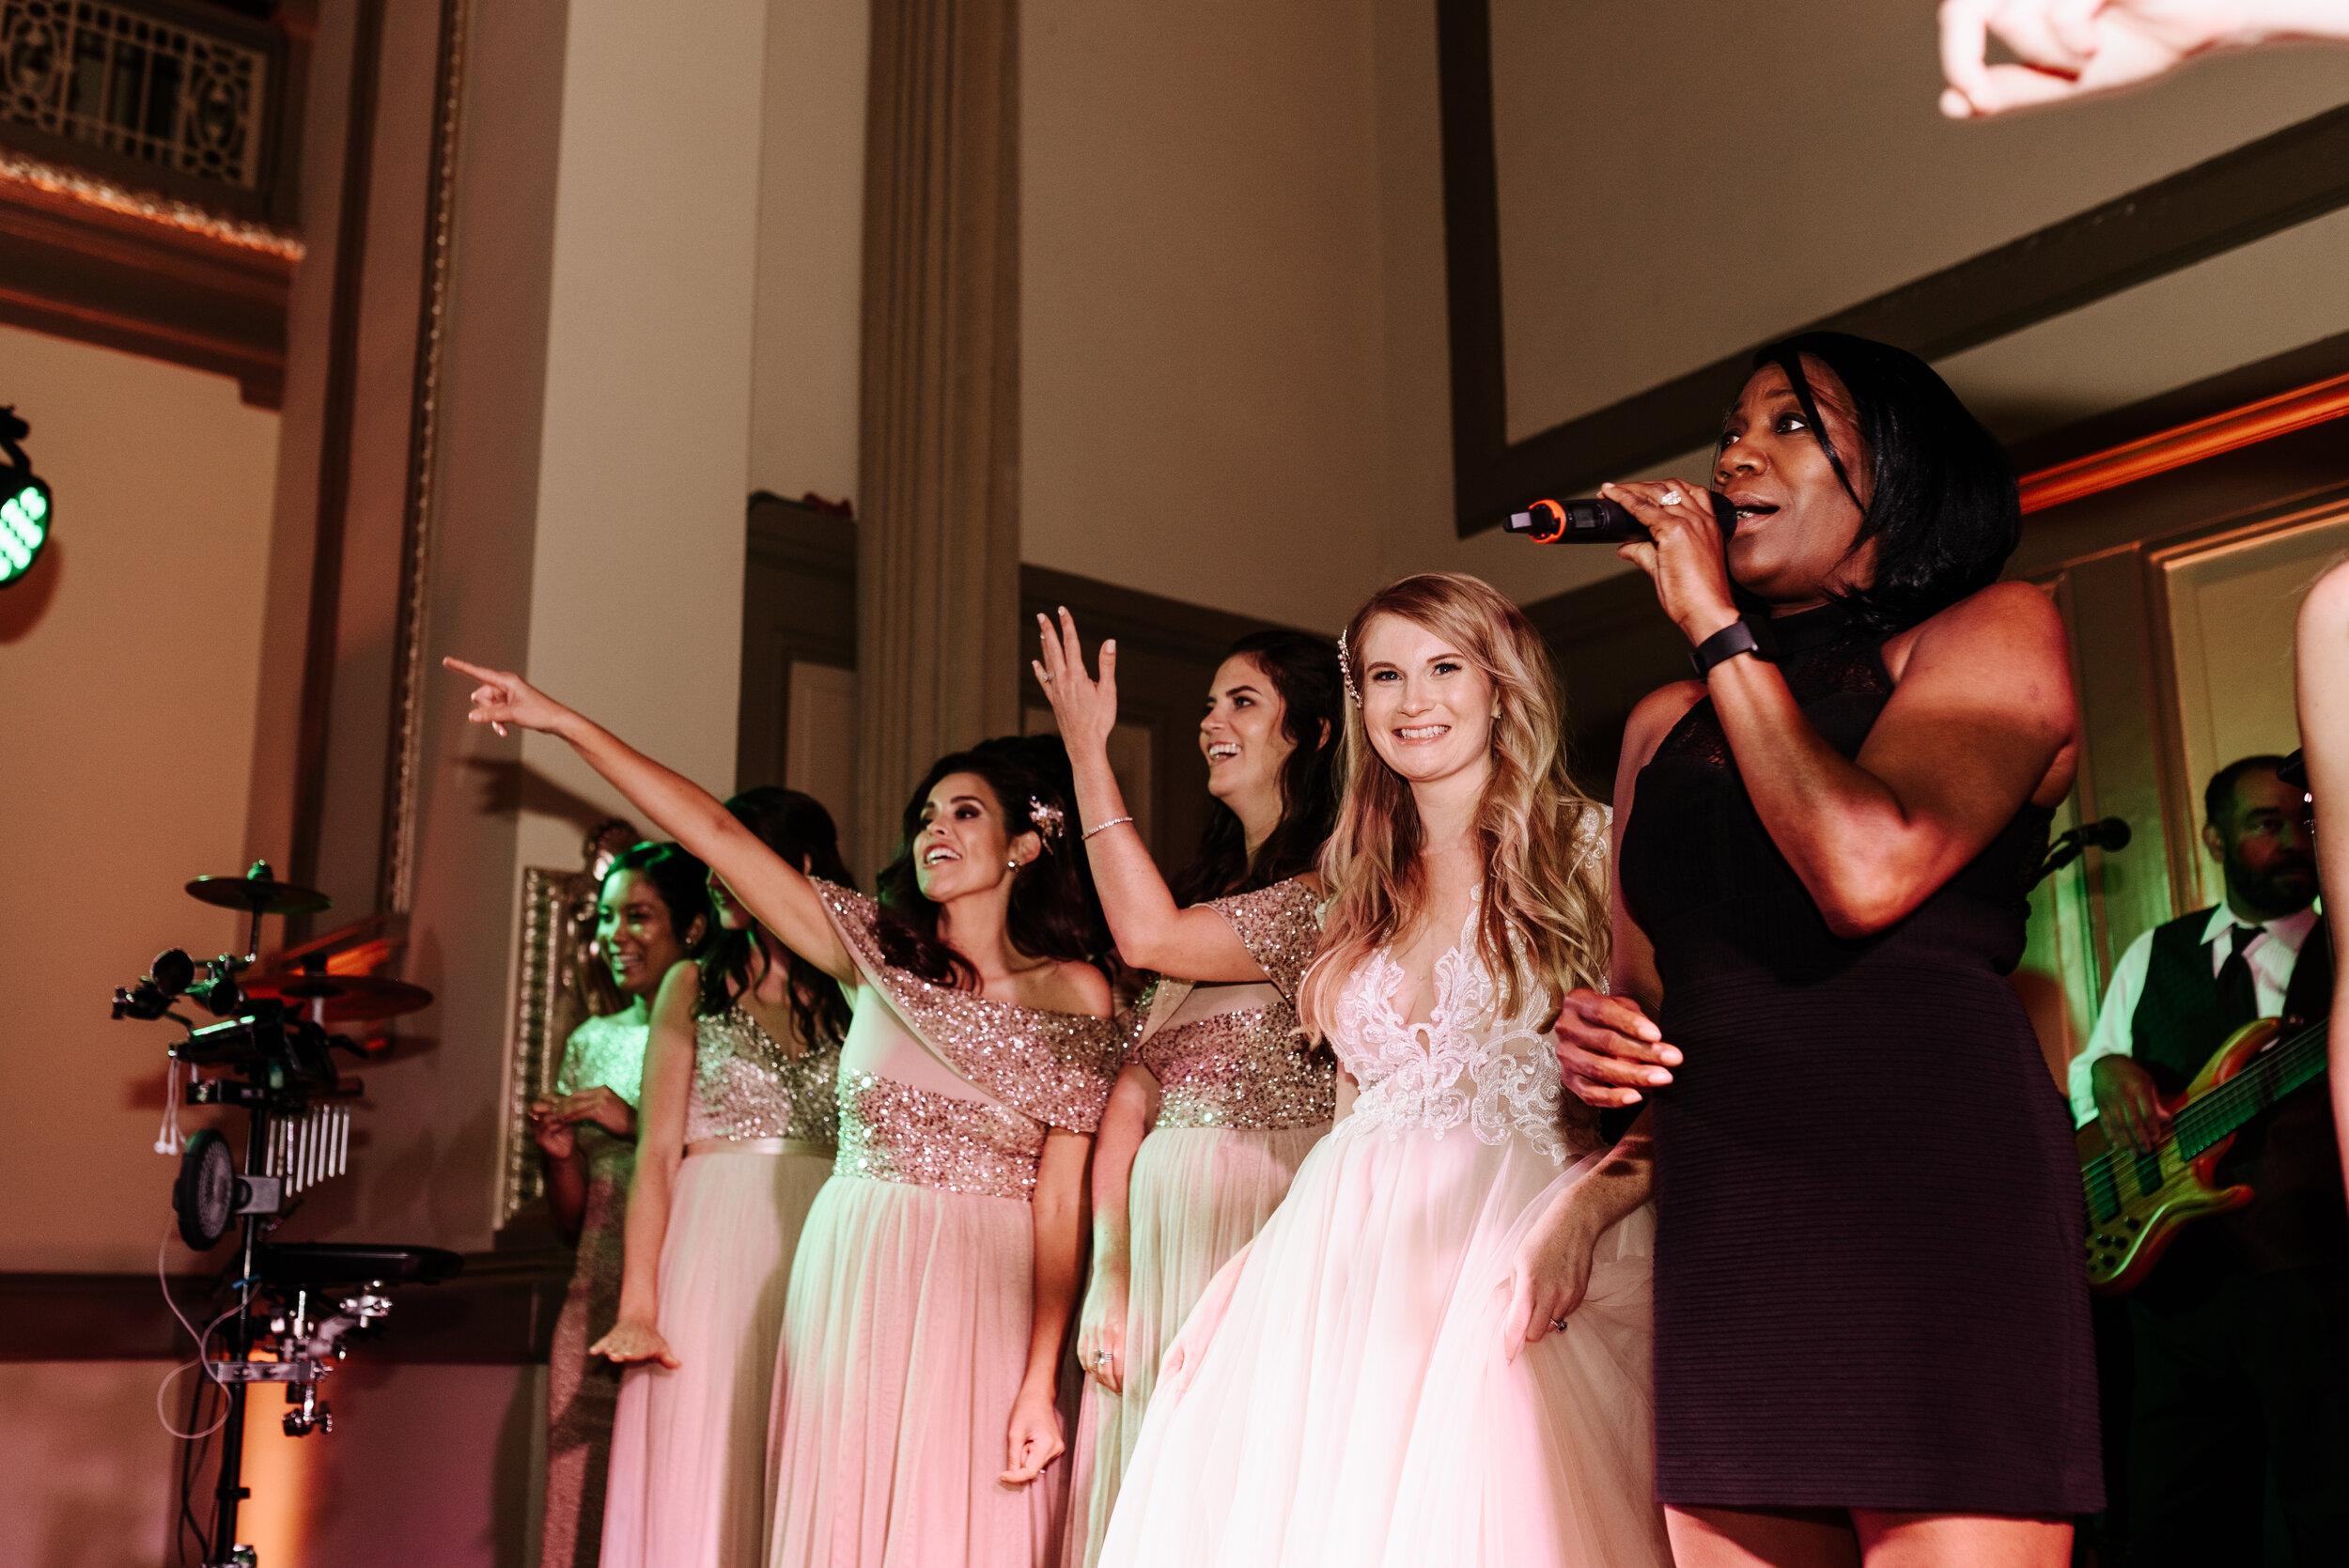 Cassie-Mrunal-Wedding-Quirk-Hotel-John-Marshall-Ballrooms-Richmond-Virginia-Photography-by-V-102.jpg